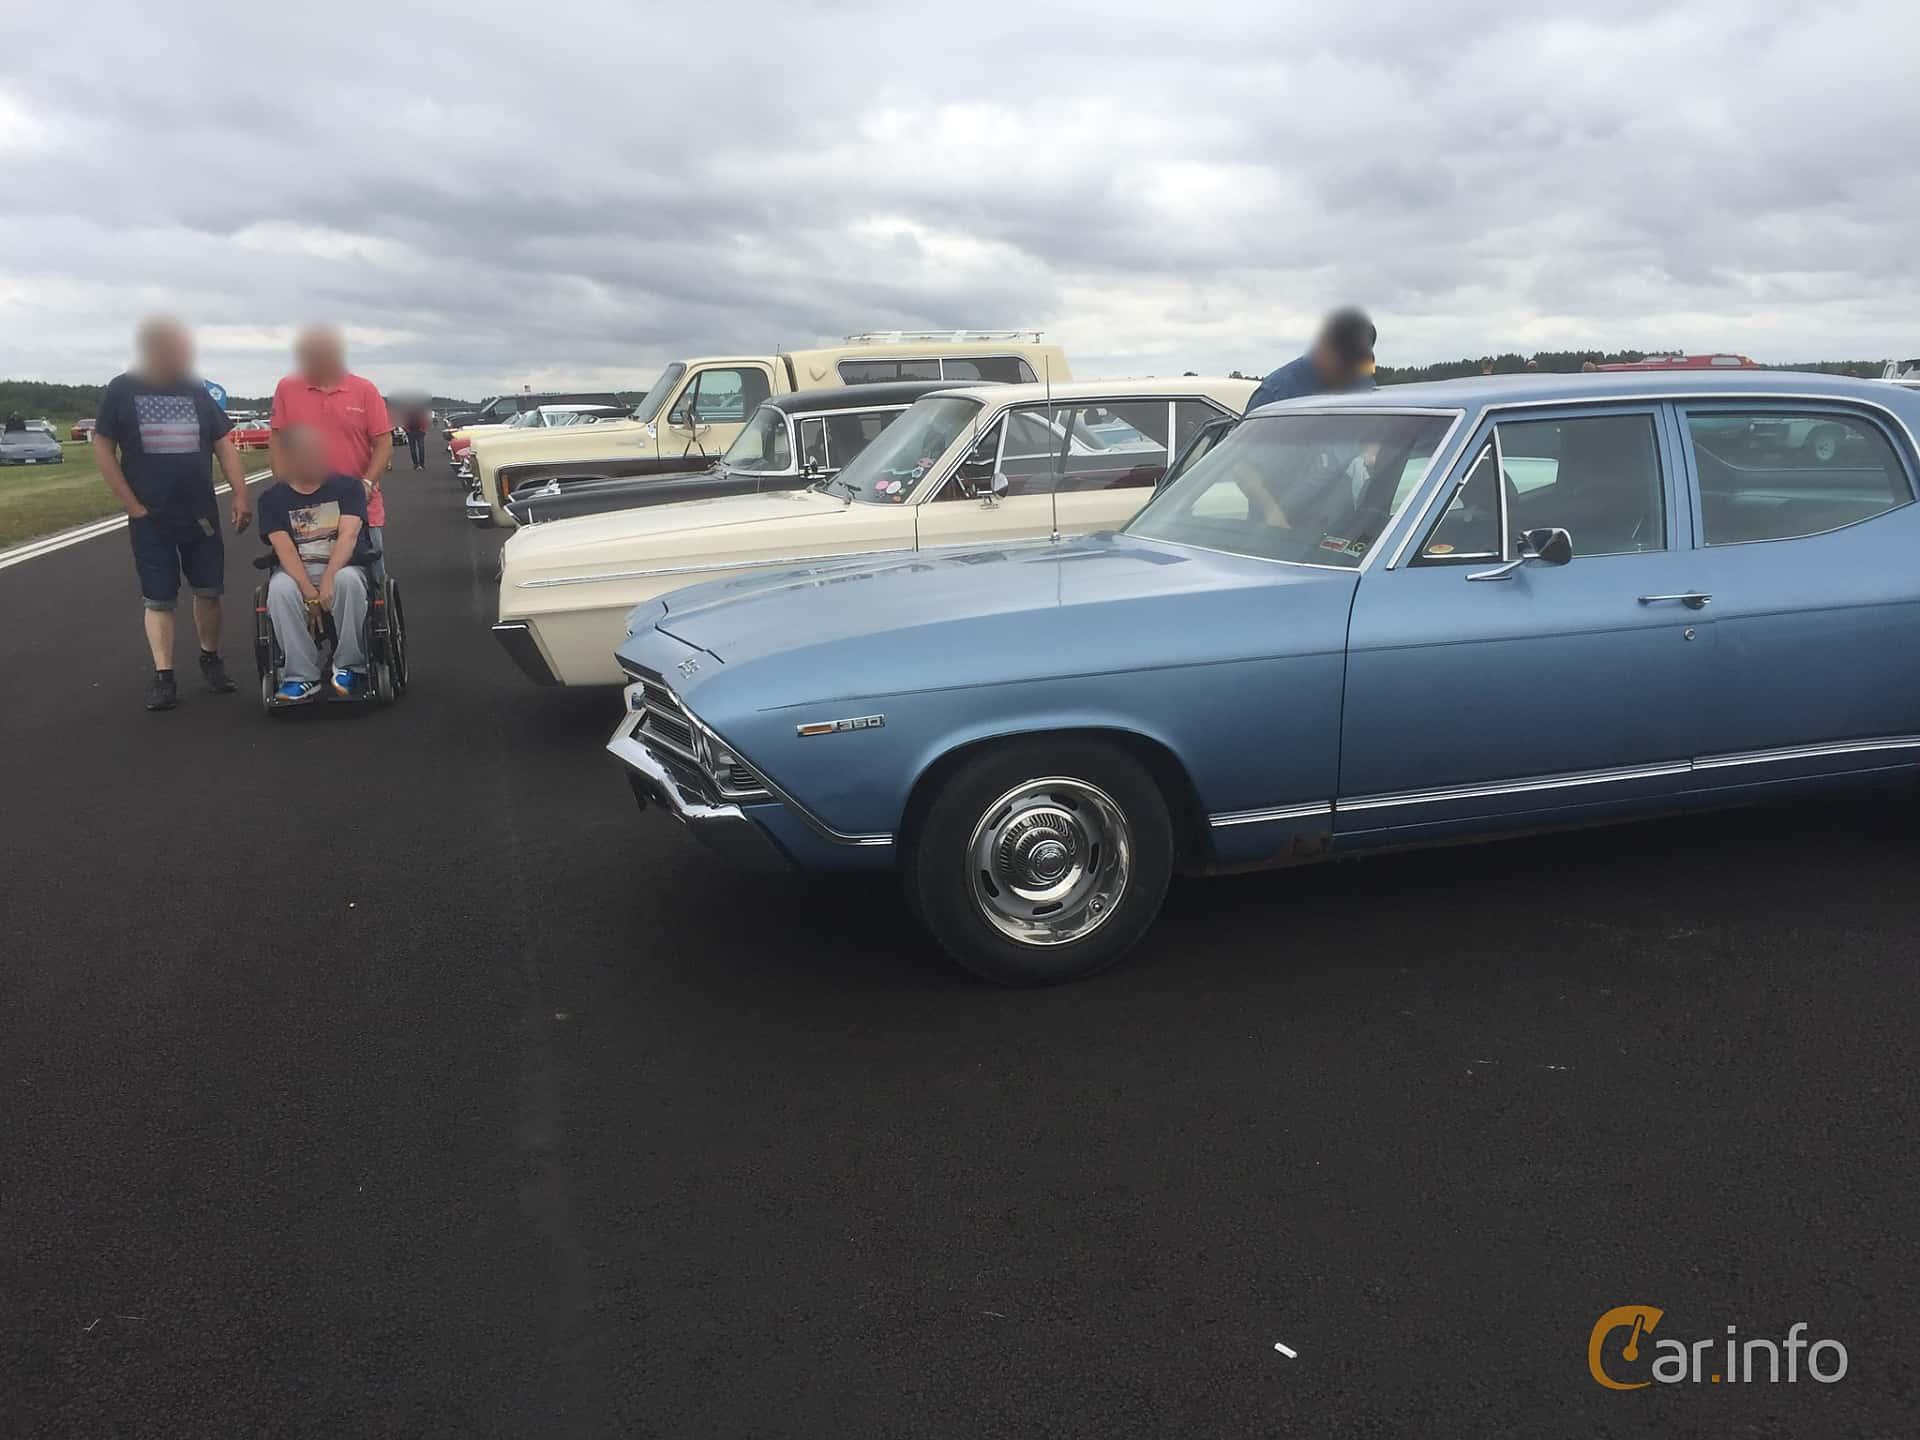 Chevrolet Chevelle Malibu Sedan 5.7 V8 Hydra-Matic, 279hp, 1969